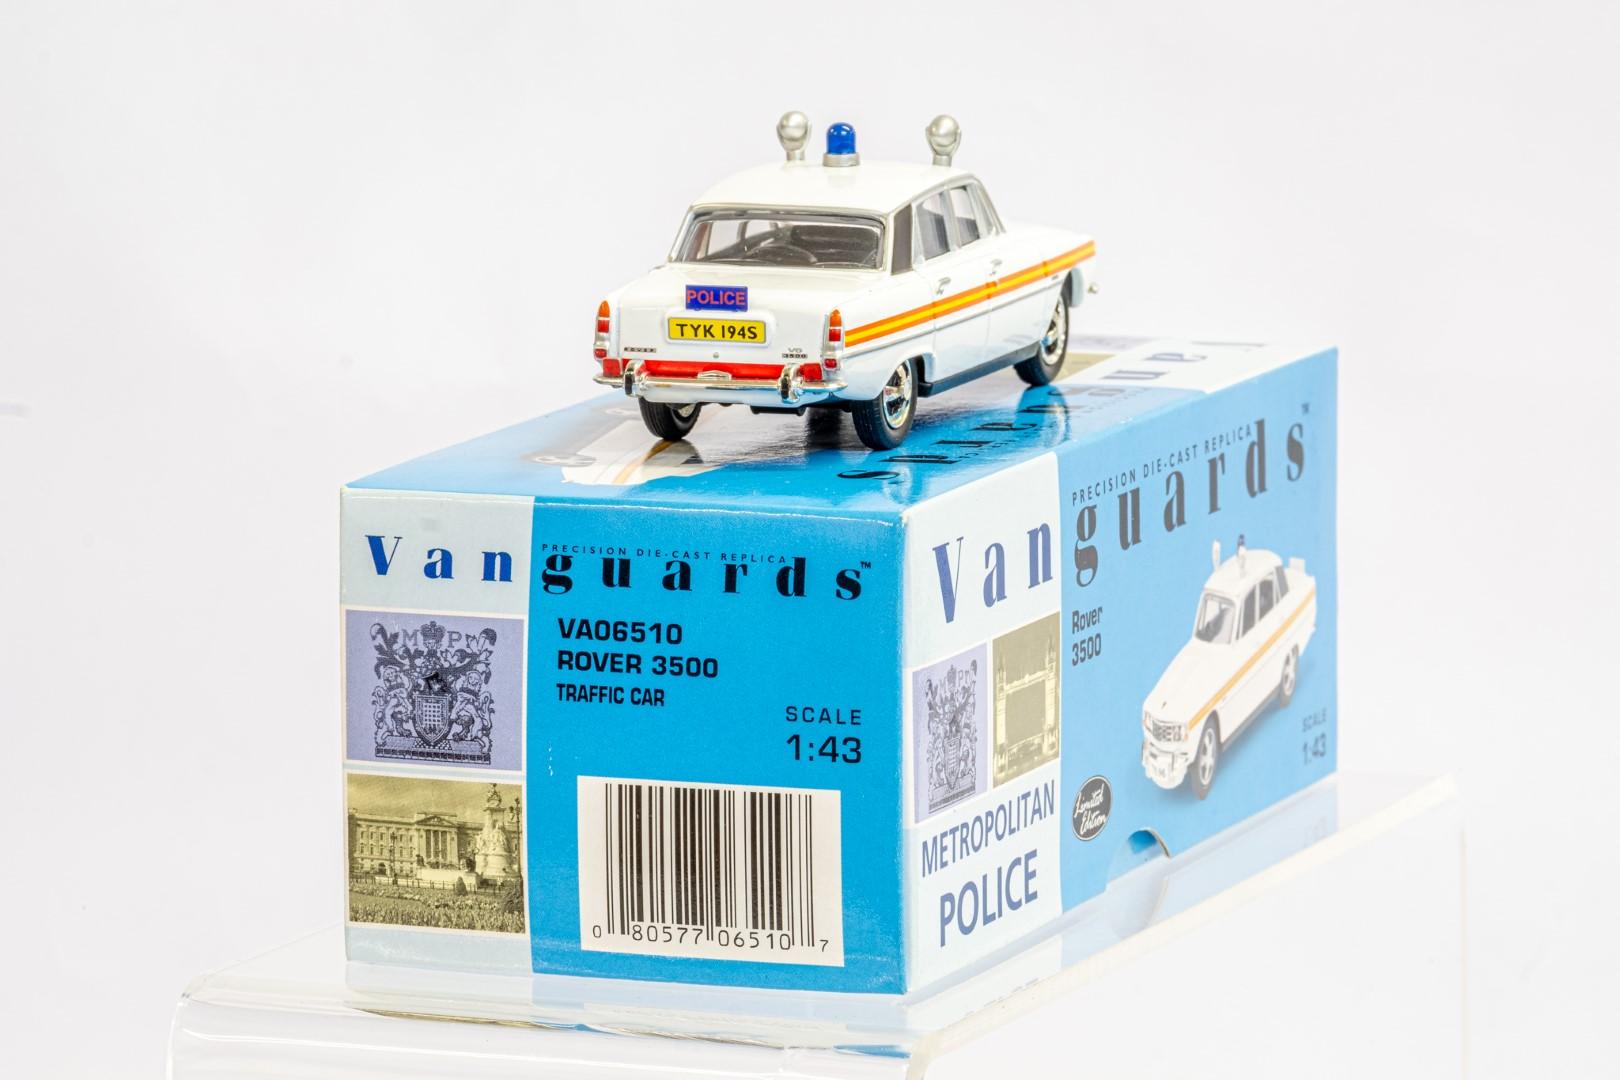 Vanguards Rover 3500 - Traffic Car - Image 4 of 8